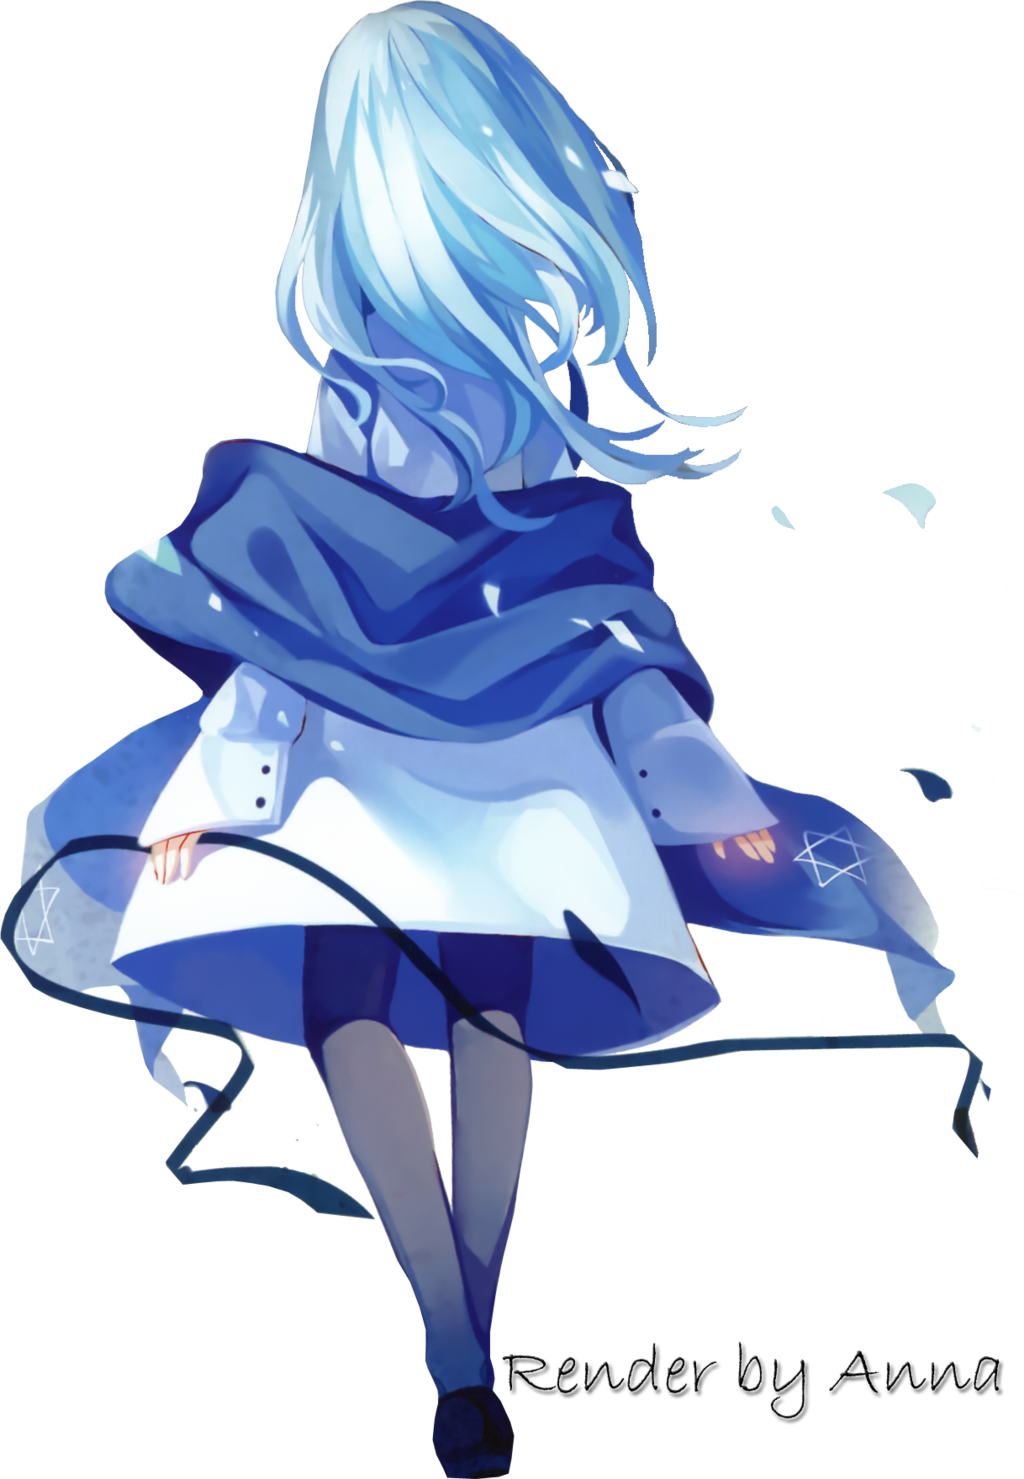 Anime girl tumblr clipart graphic transparent library HD Anime Girl Tumblr Transparent Clipart Free Download - Blue Anime ... graphic transparent library